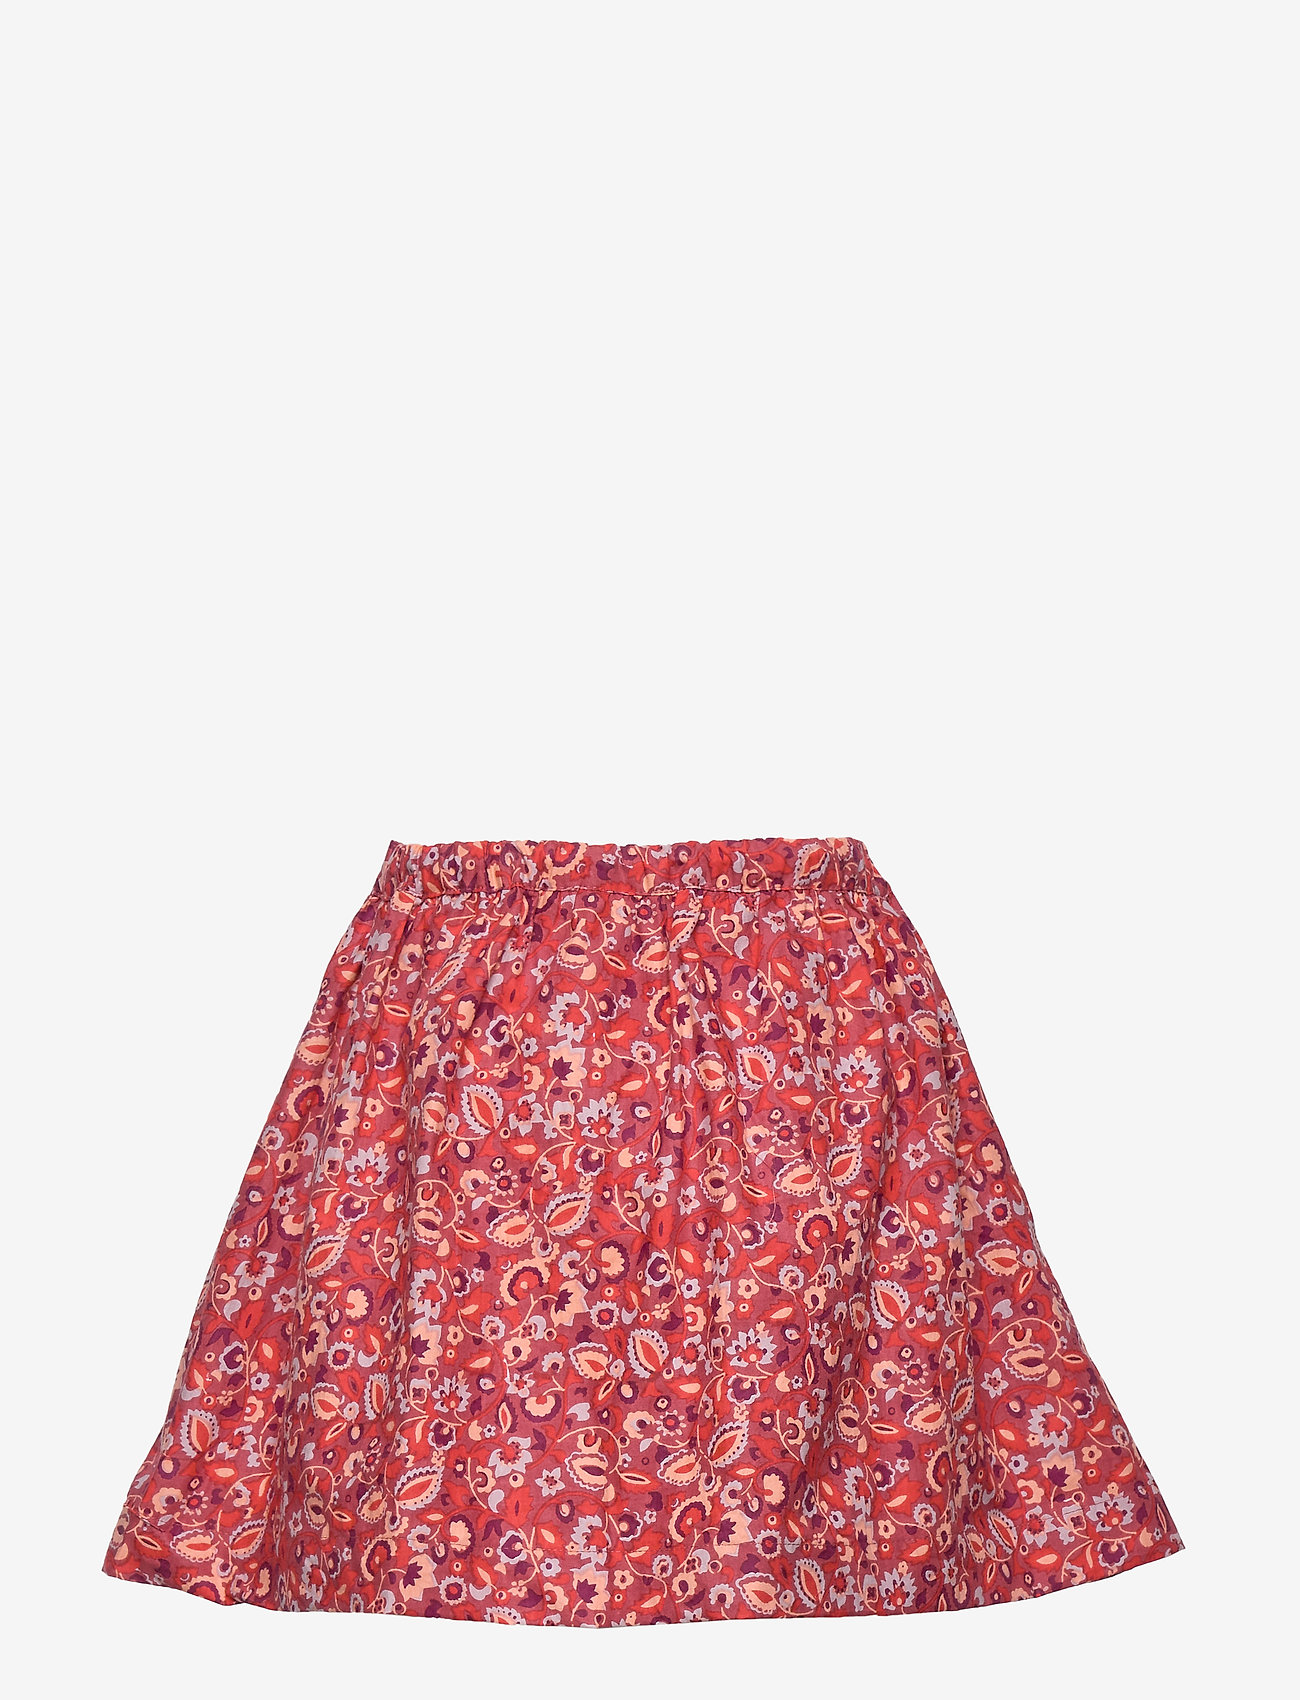 Noa Noa Miniature - Skirt - skirts - baroque rose - 1